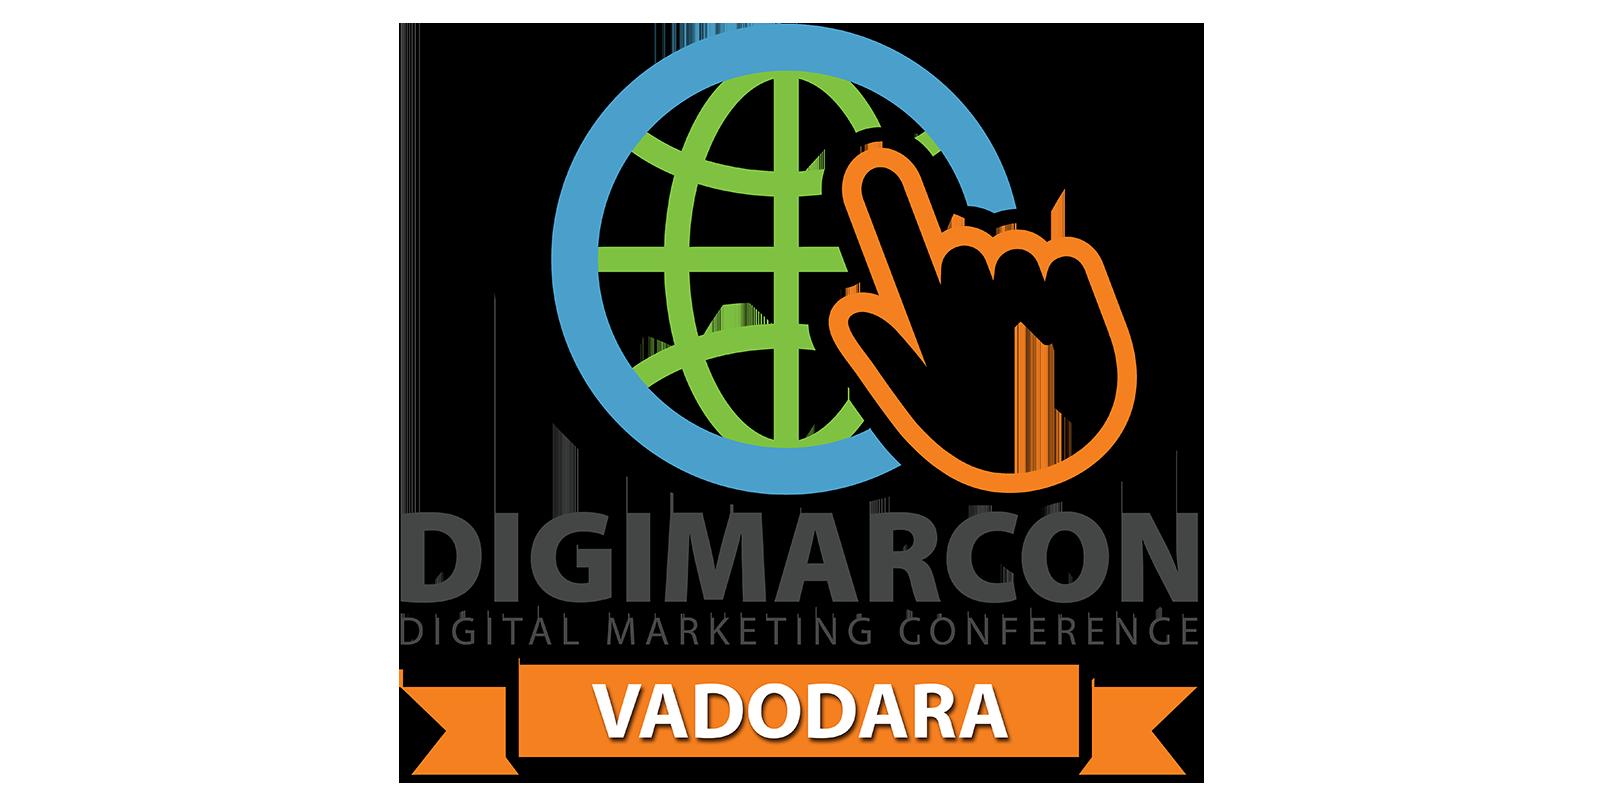 Vadodara Digital Marketing Conference